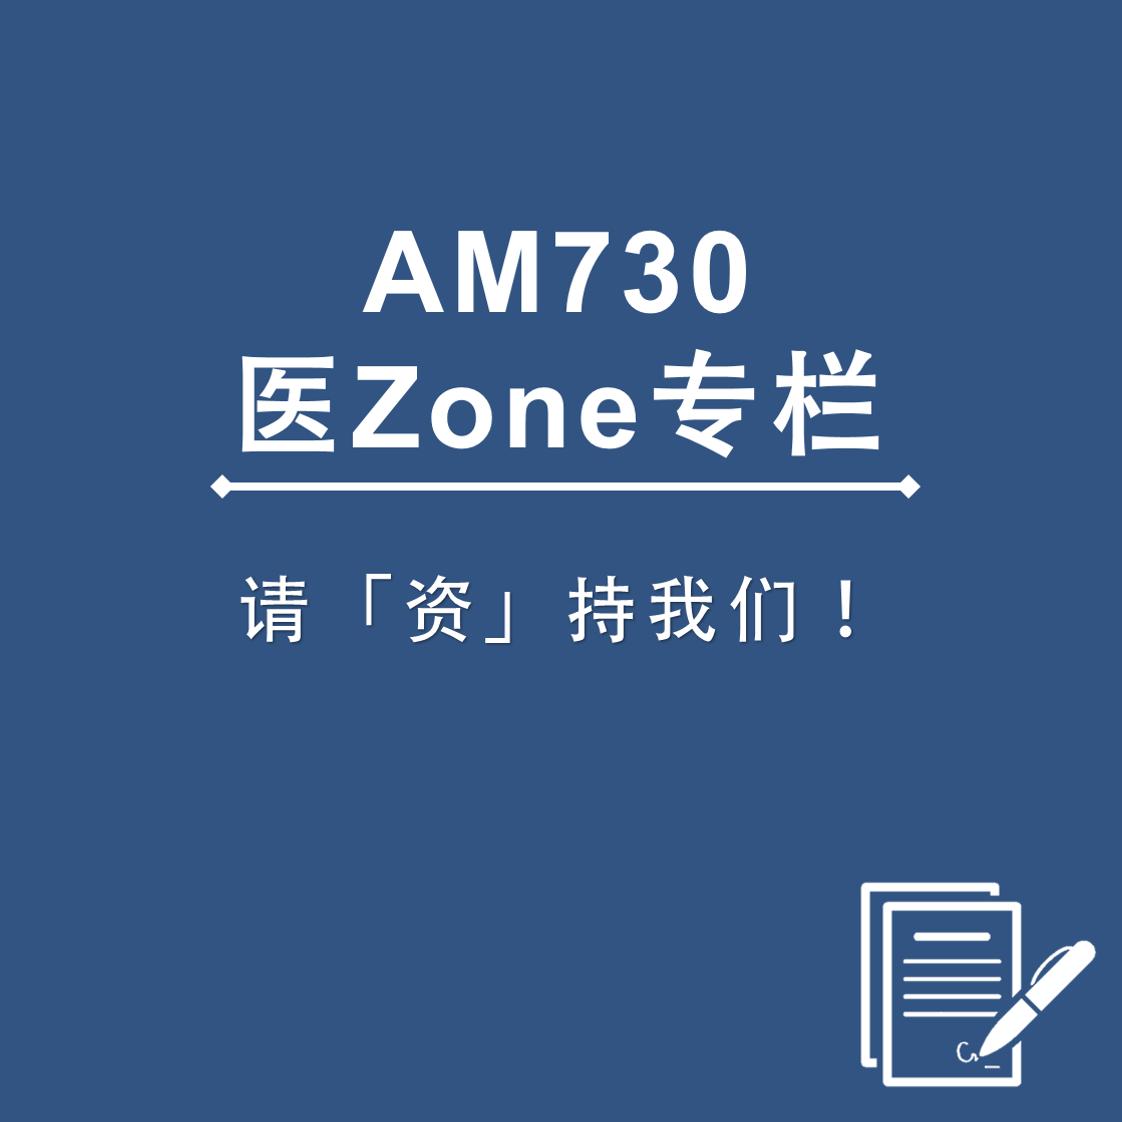 AM730 医Zone 专栏 - 请「资」持我们!